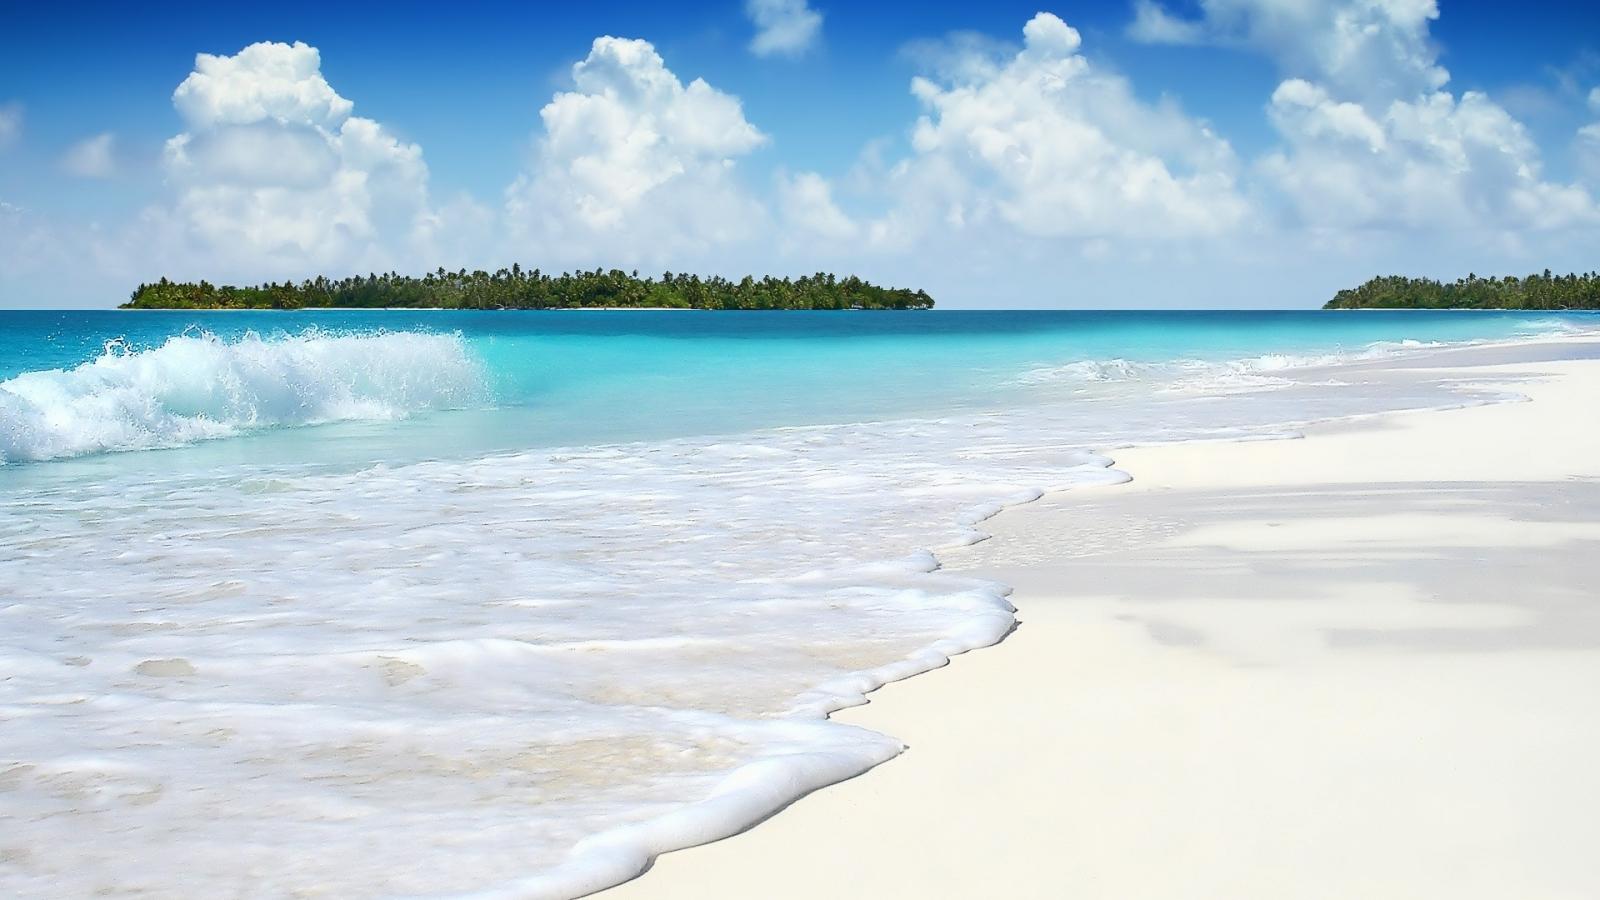 Hermosa playa - 1600x900